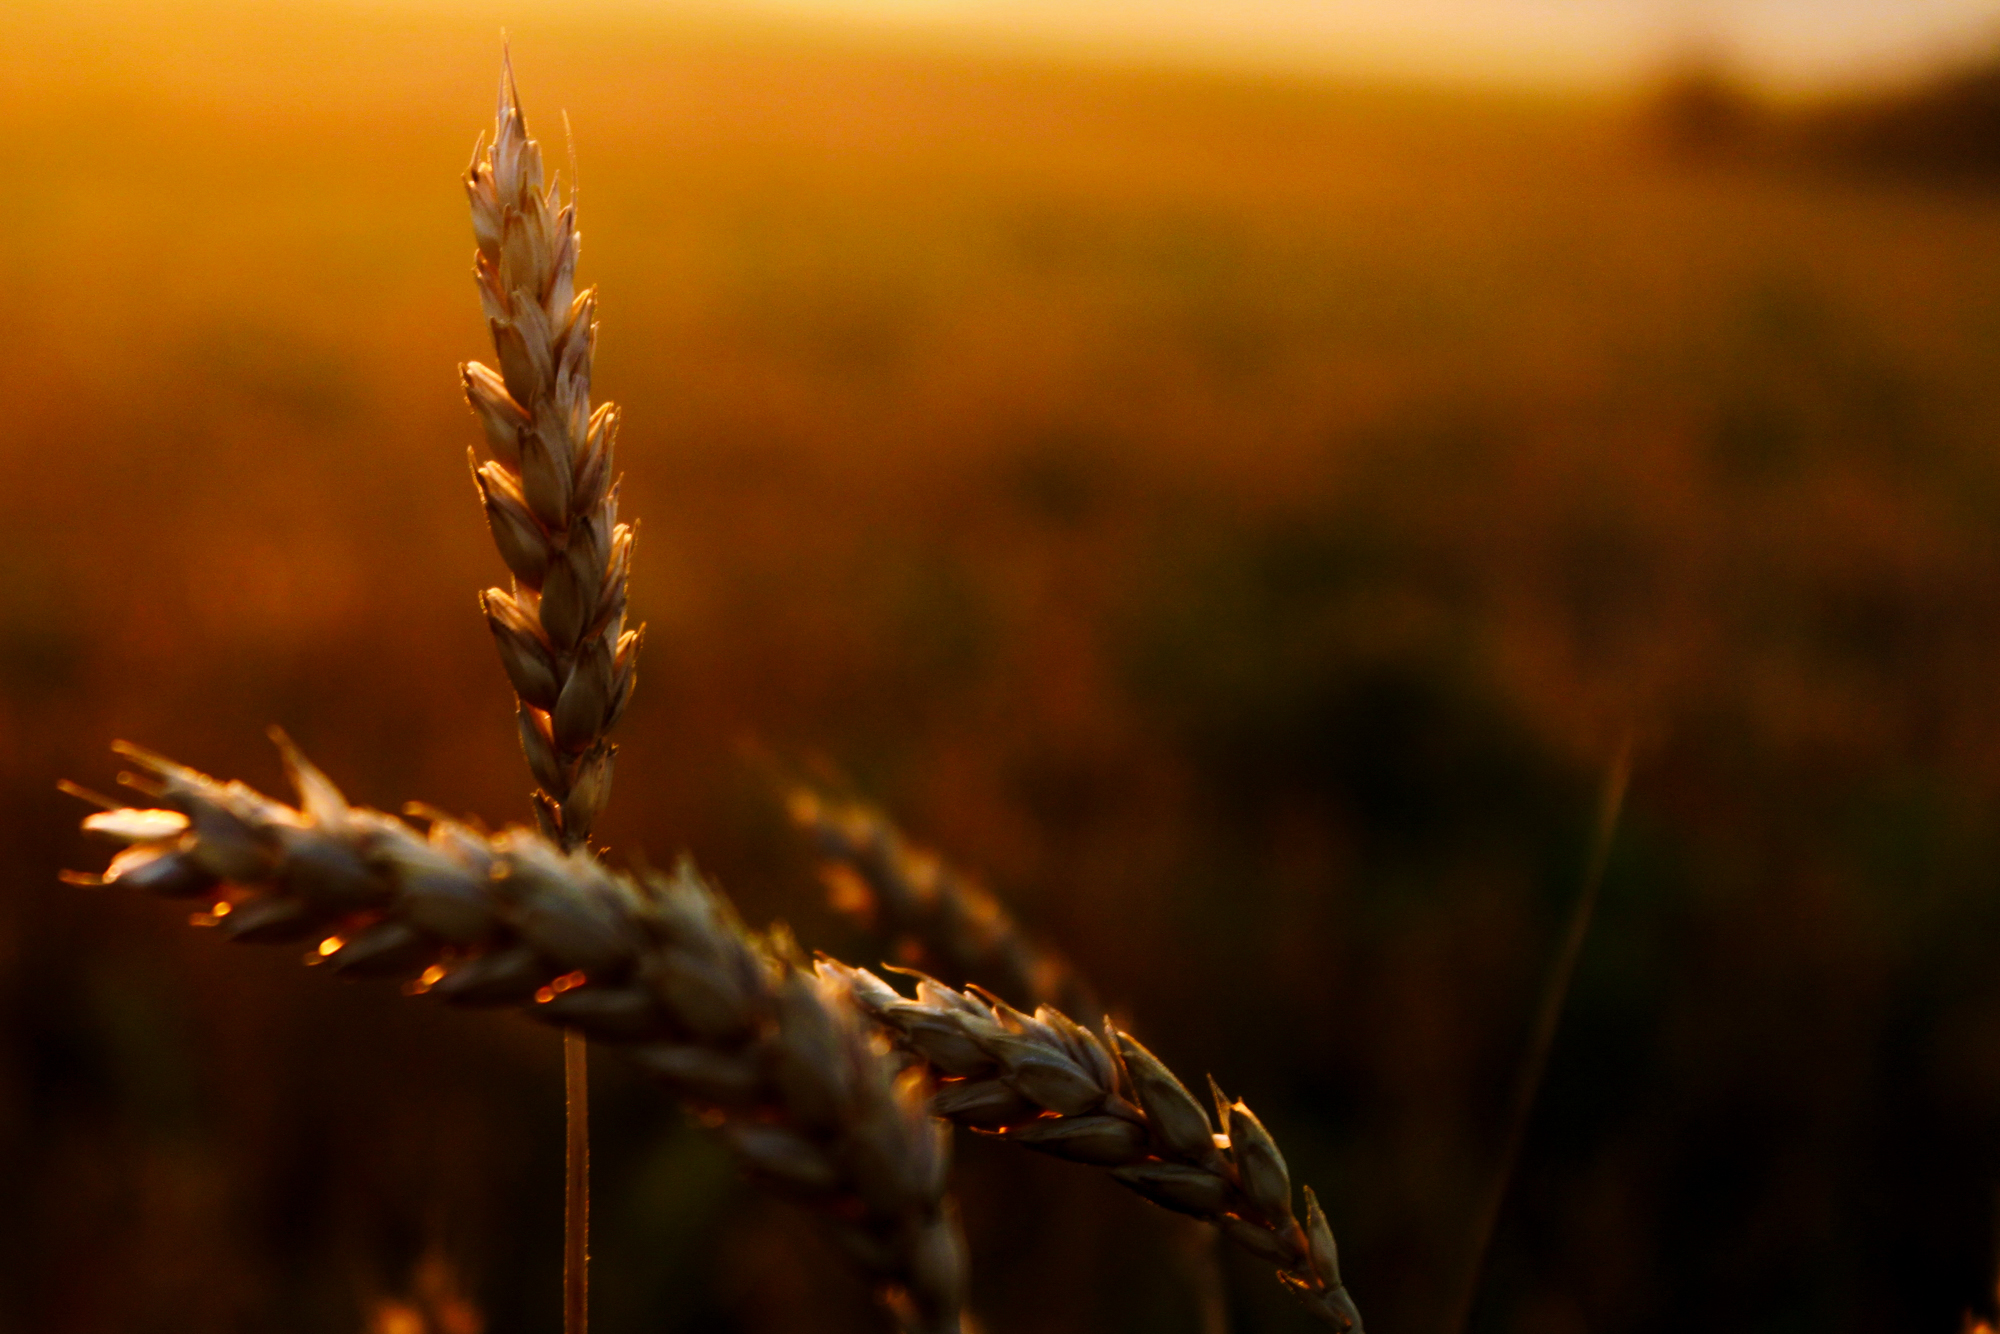 Gentle Morning Light on the Grasses